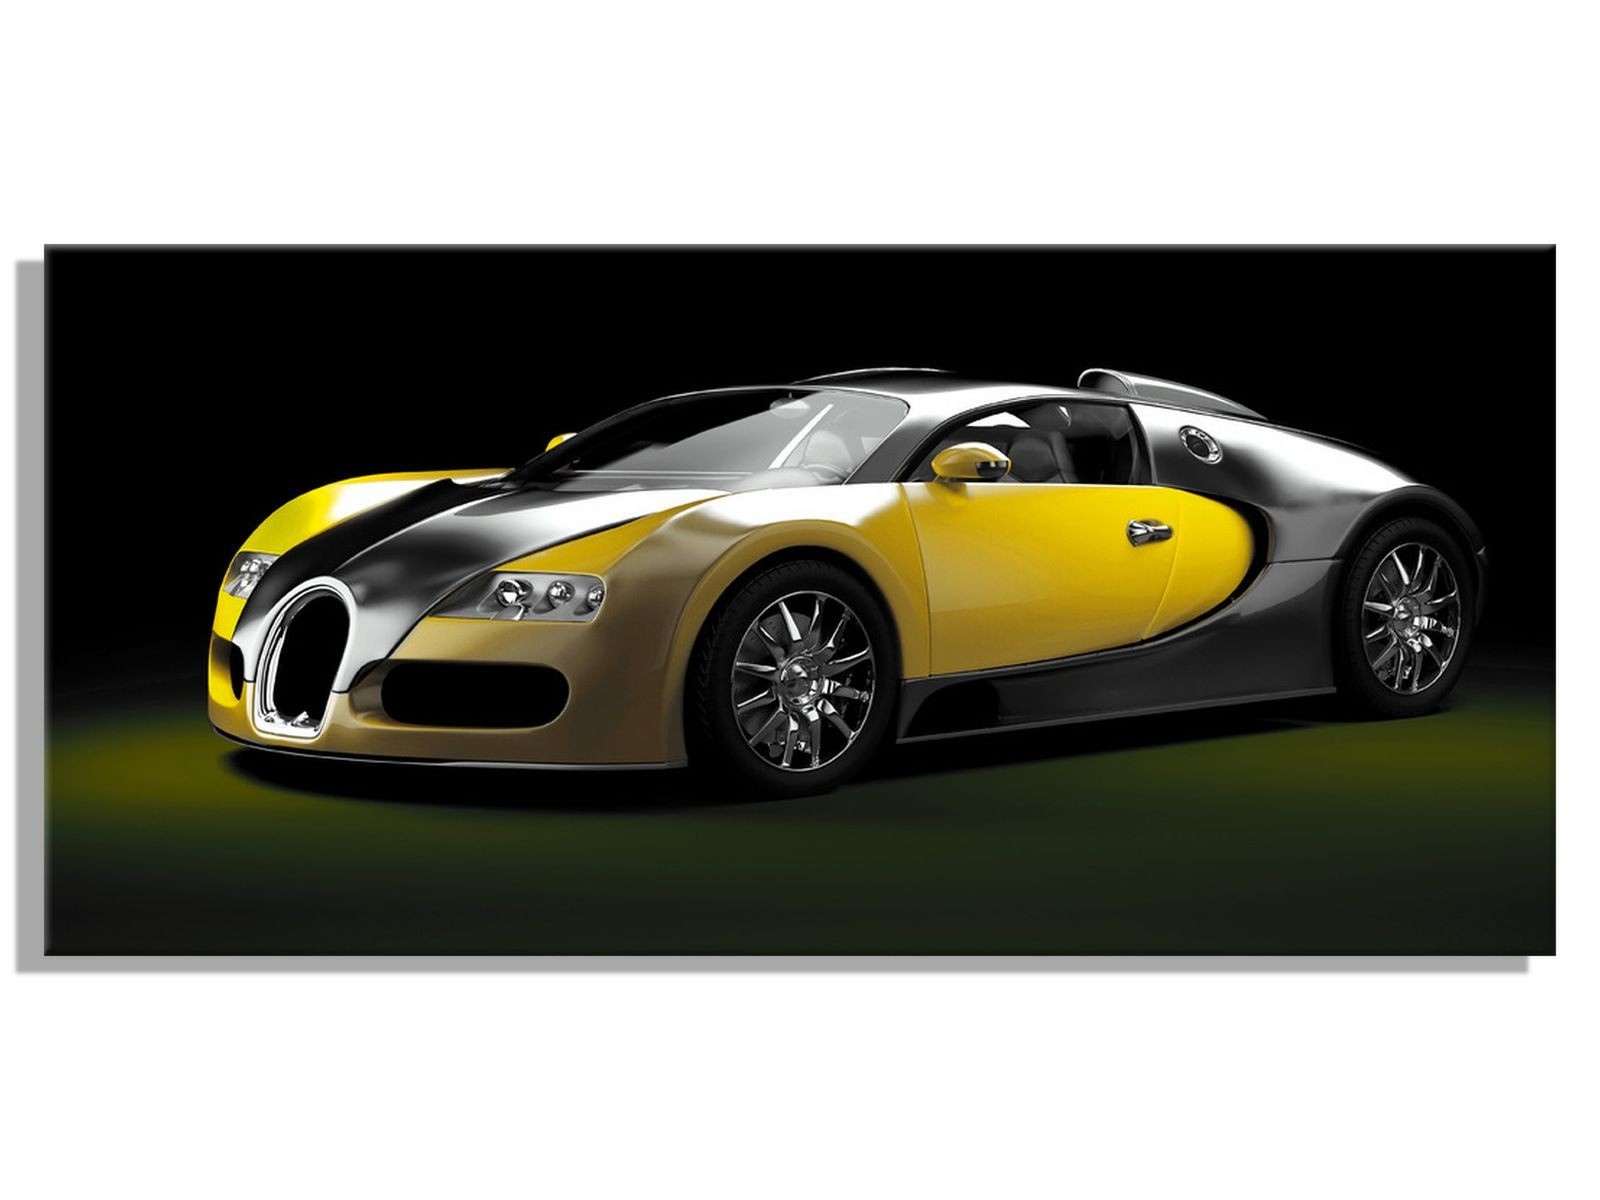 Bugatti Veyron Engine Diagram Obraz 115×55 Å ³Å'te Bugatti Veyron Samoch³d Allegro Of Bugatti Veyron Engine Diagram